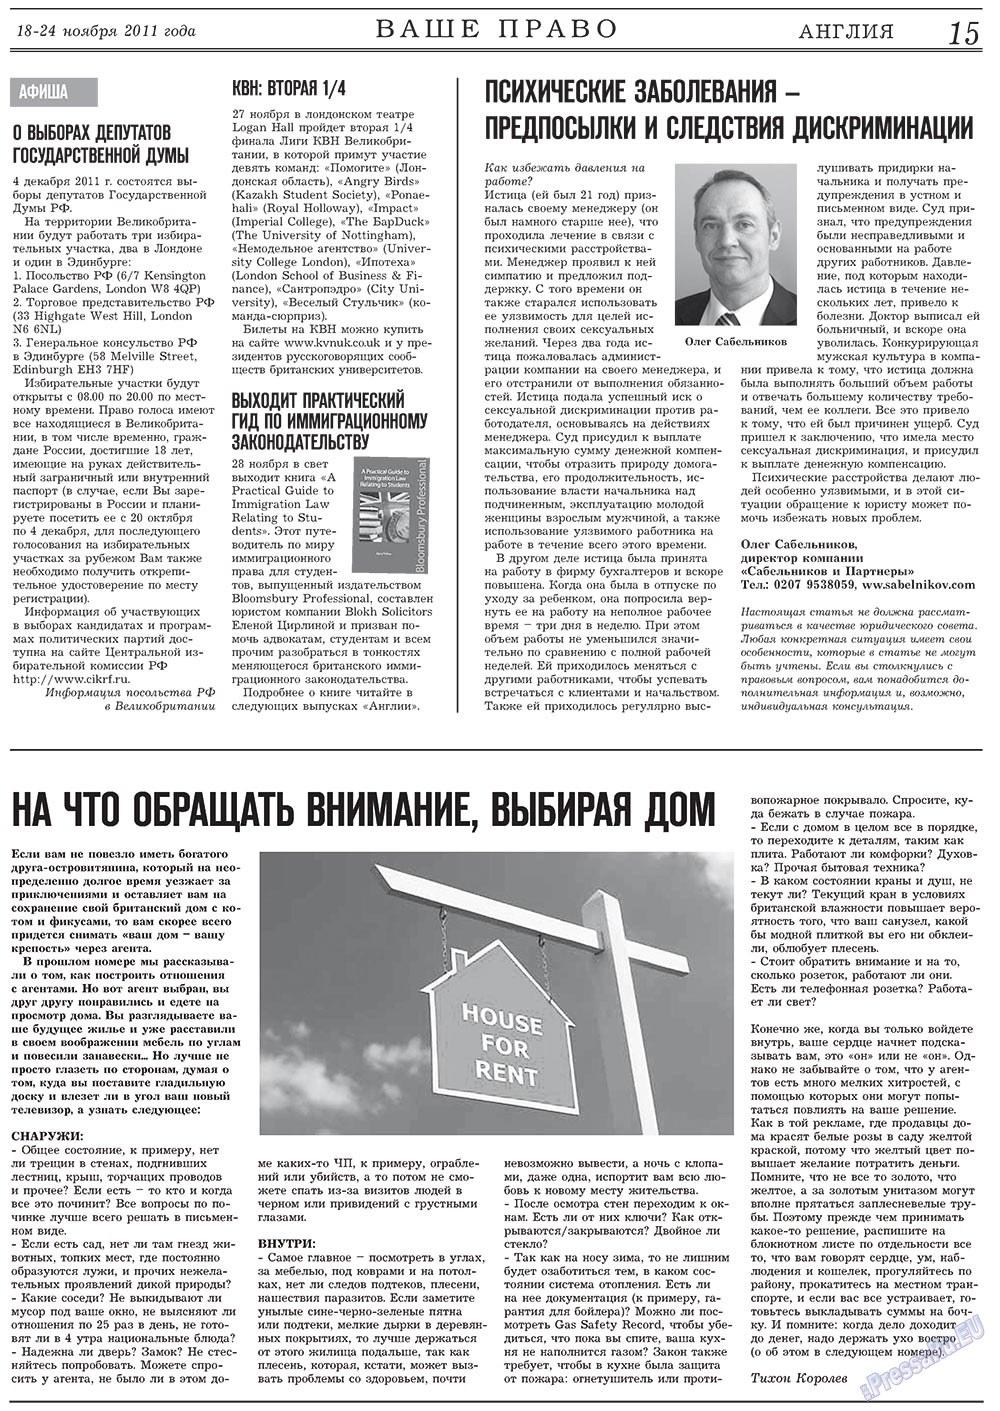 Англия (газета). 2011 год, номер 42, стр. 15